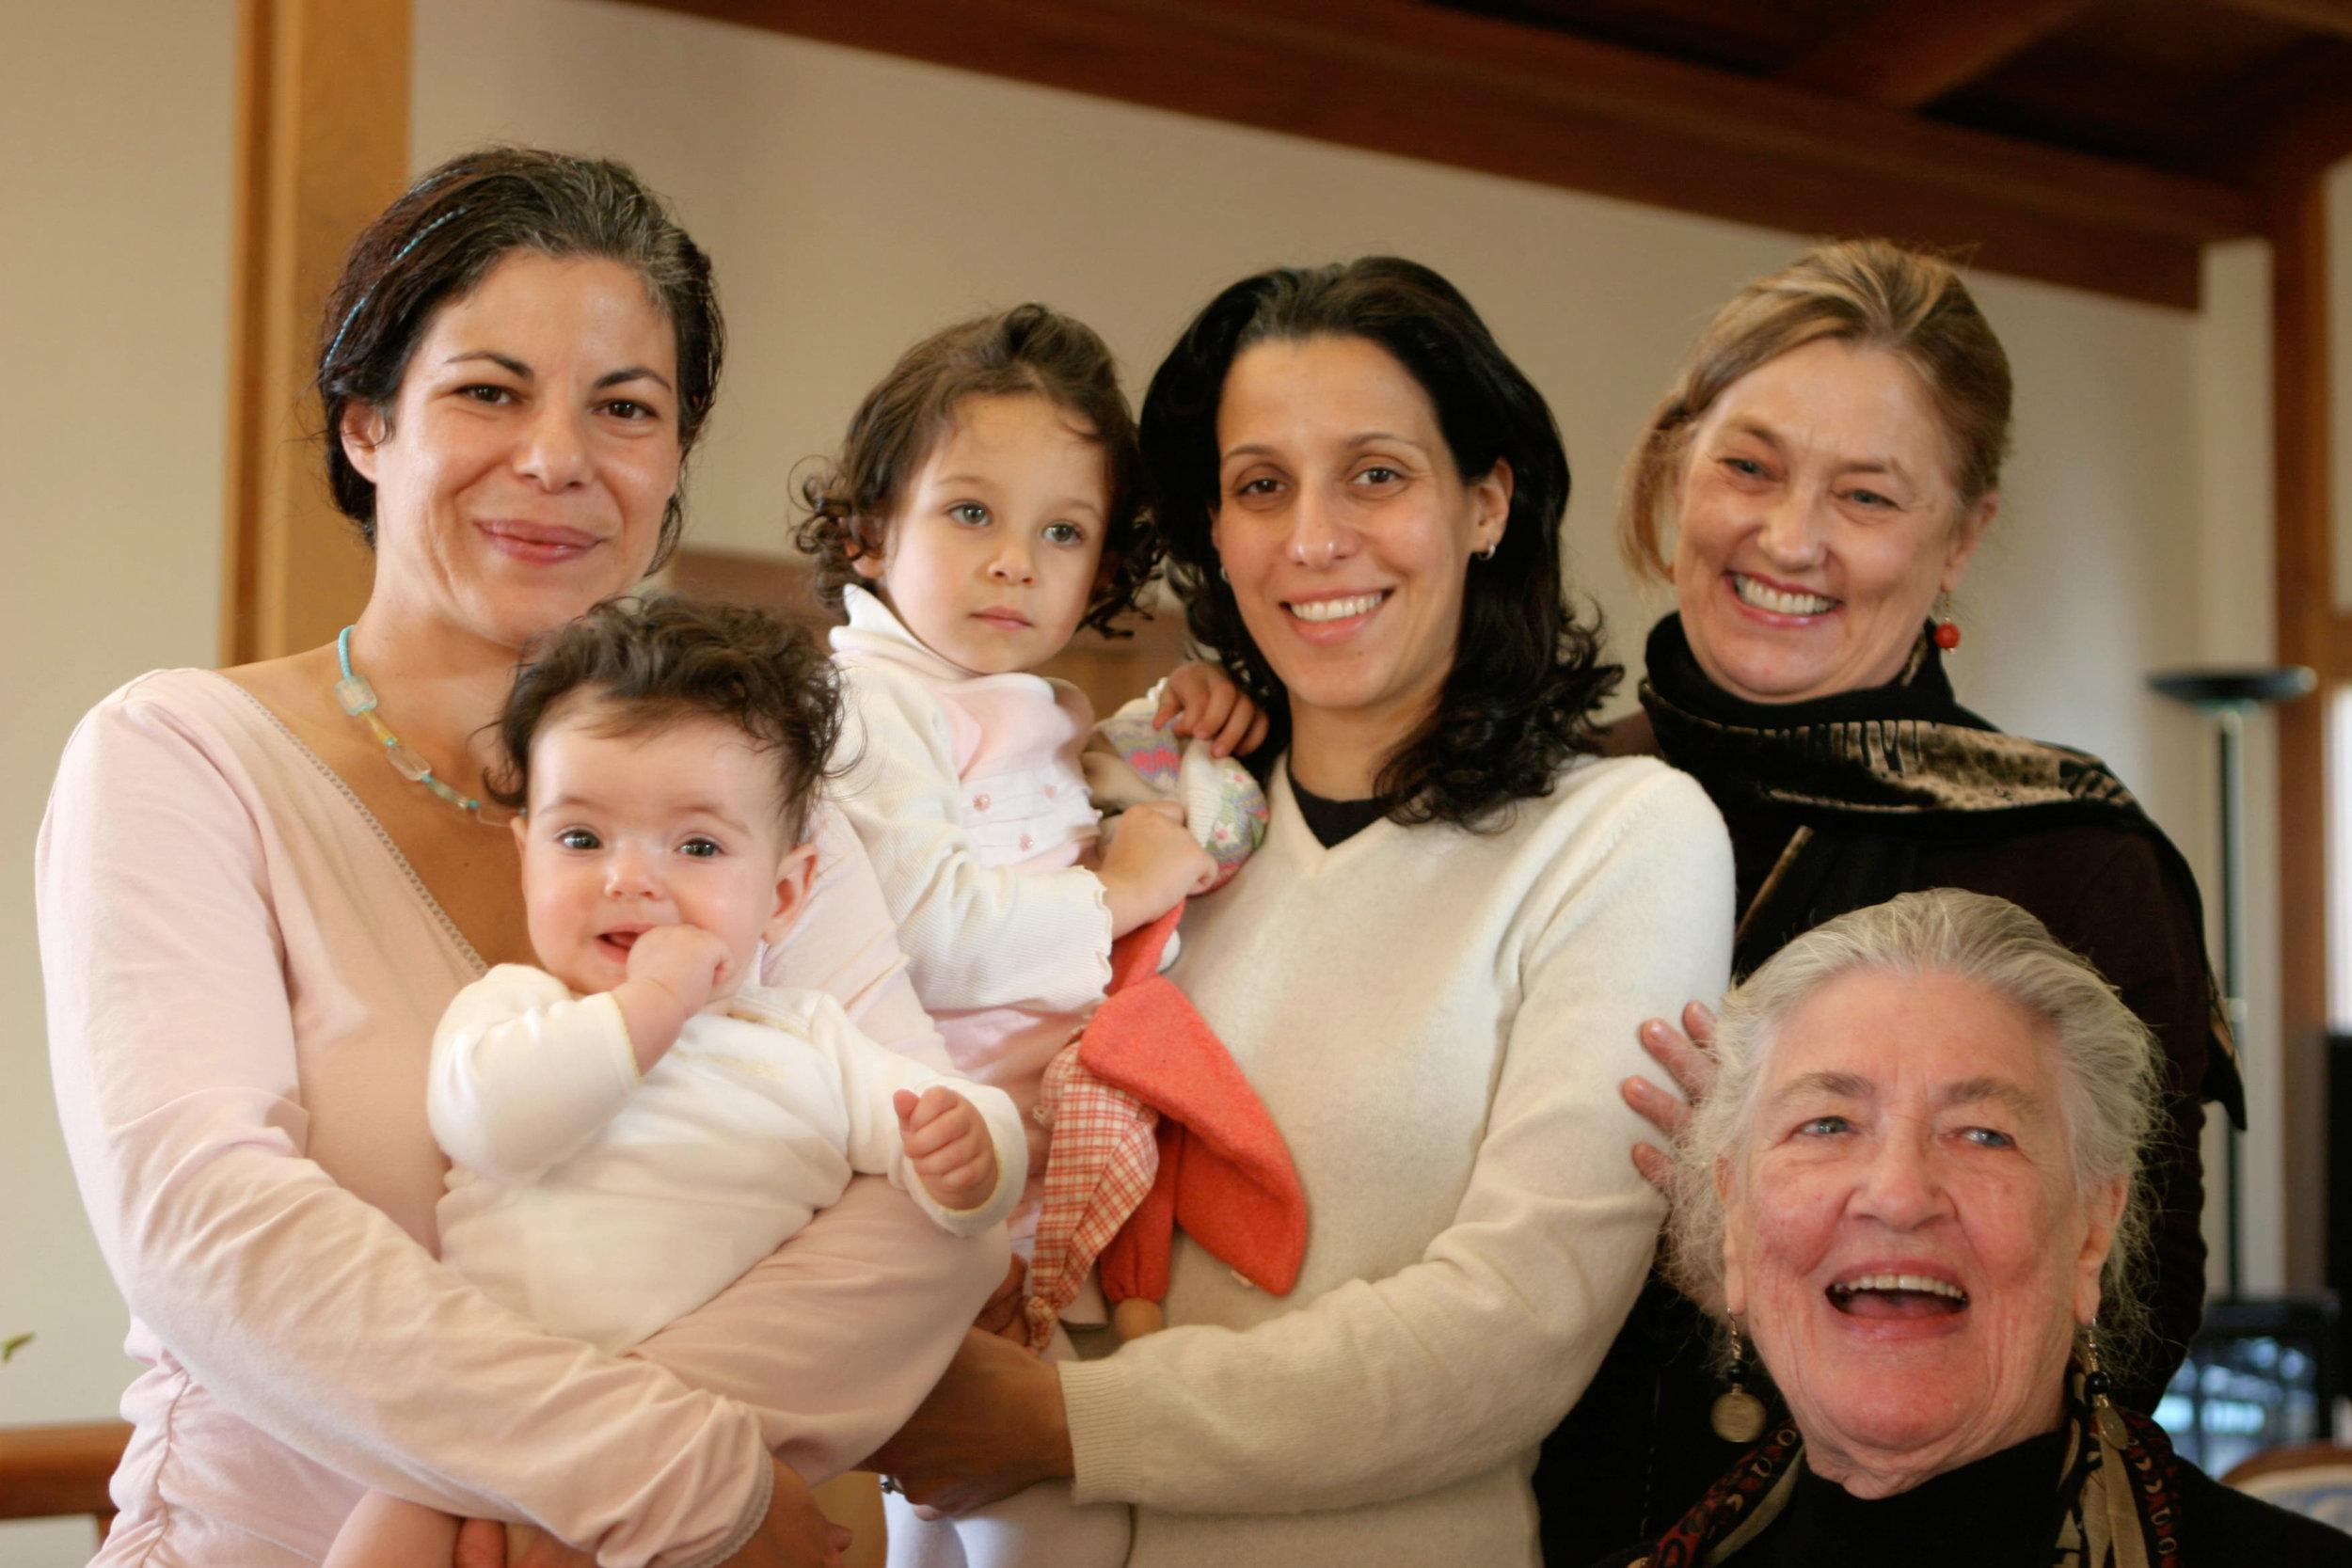 Tash with Zahra Mahloudji, Leili Javid, their babies, and Eliza